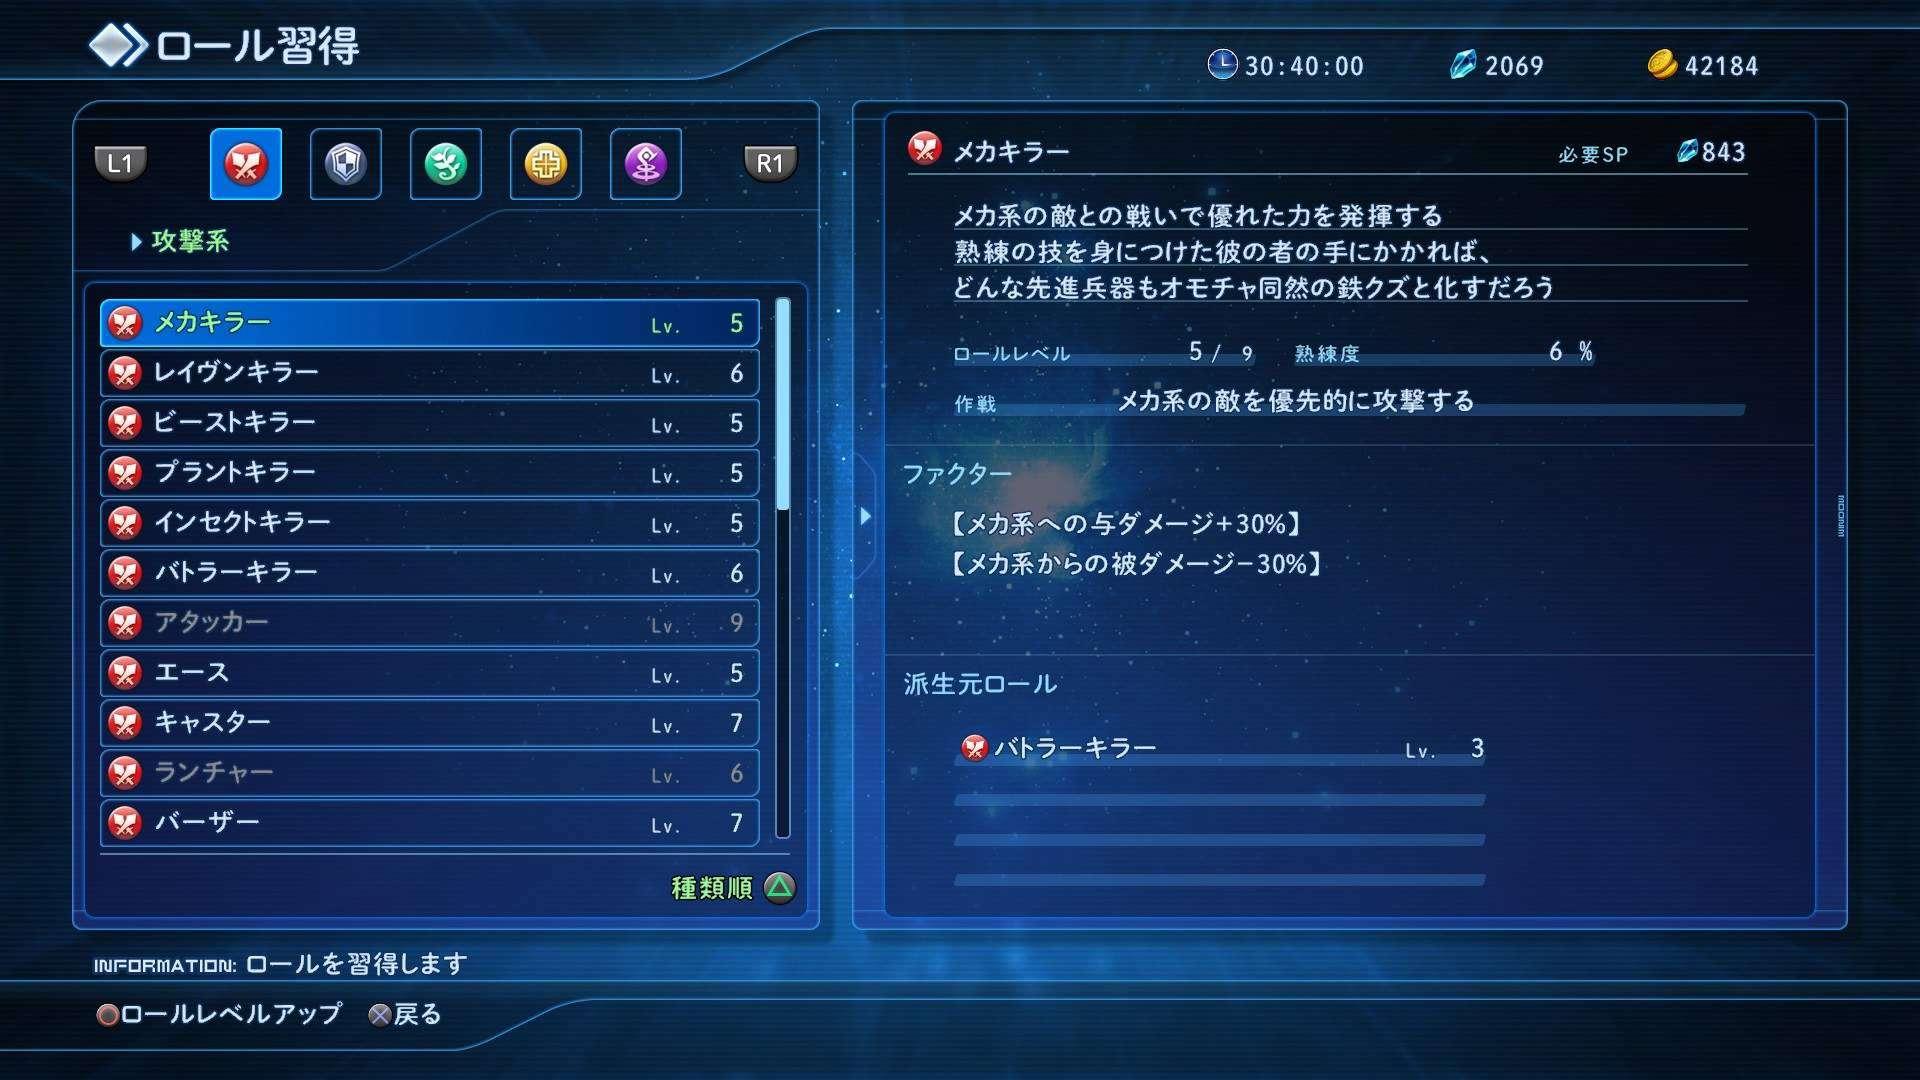 Pemilihan Peran (1) (tri-Ace, Inc / Square Enix)